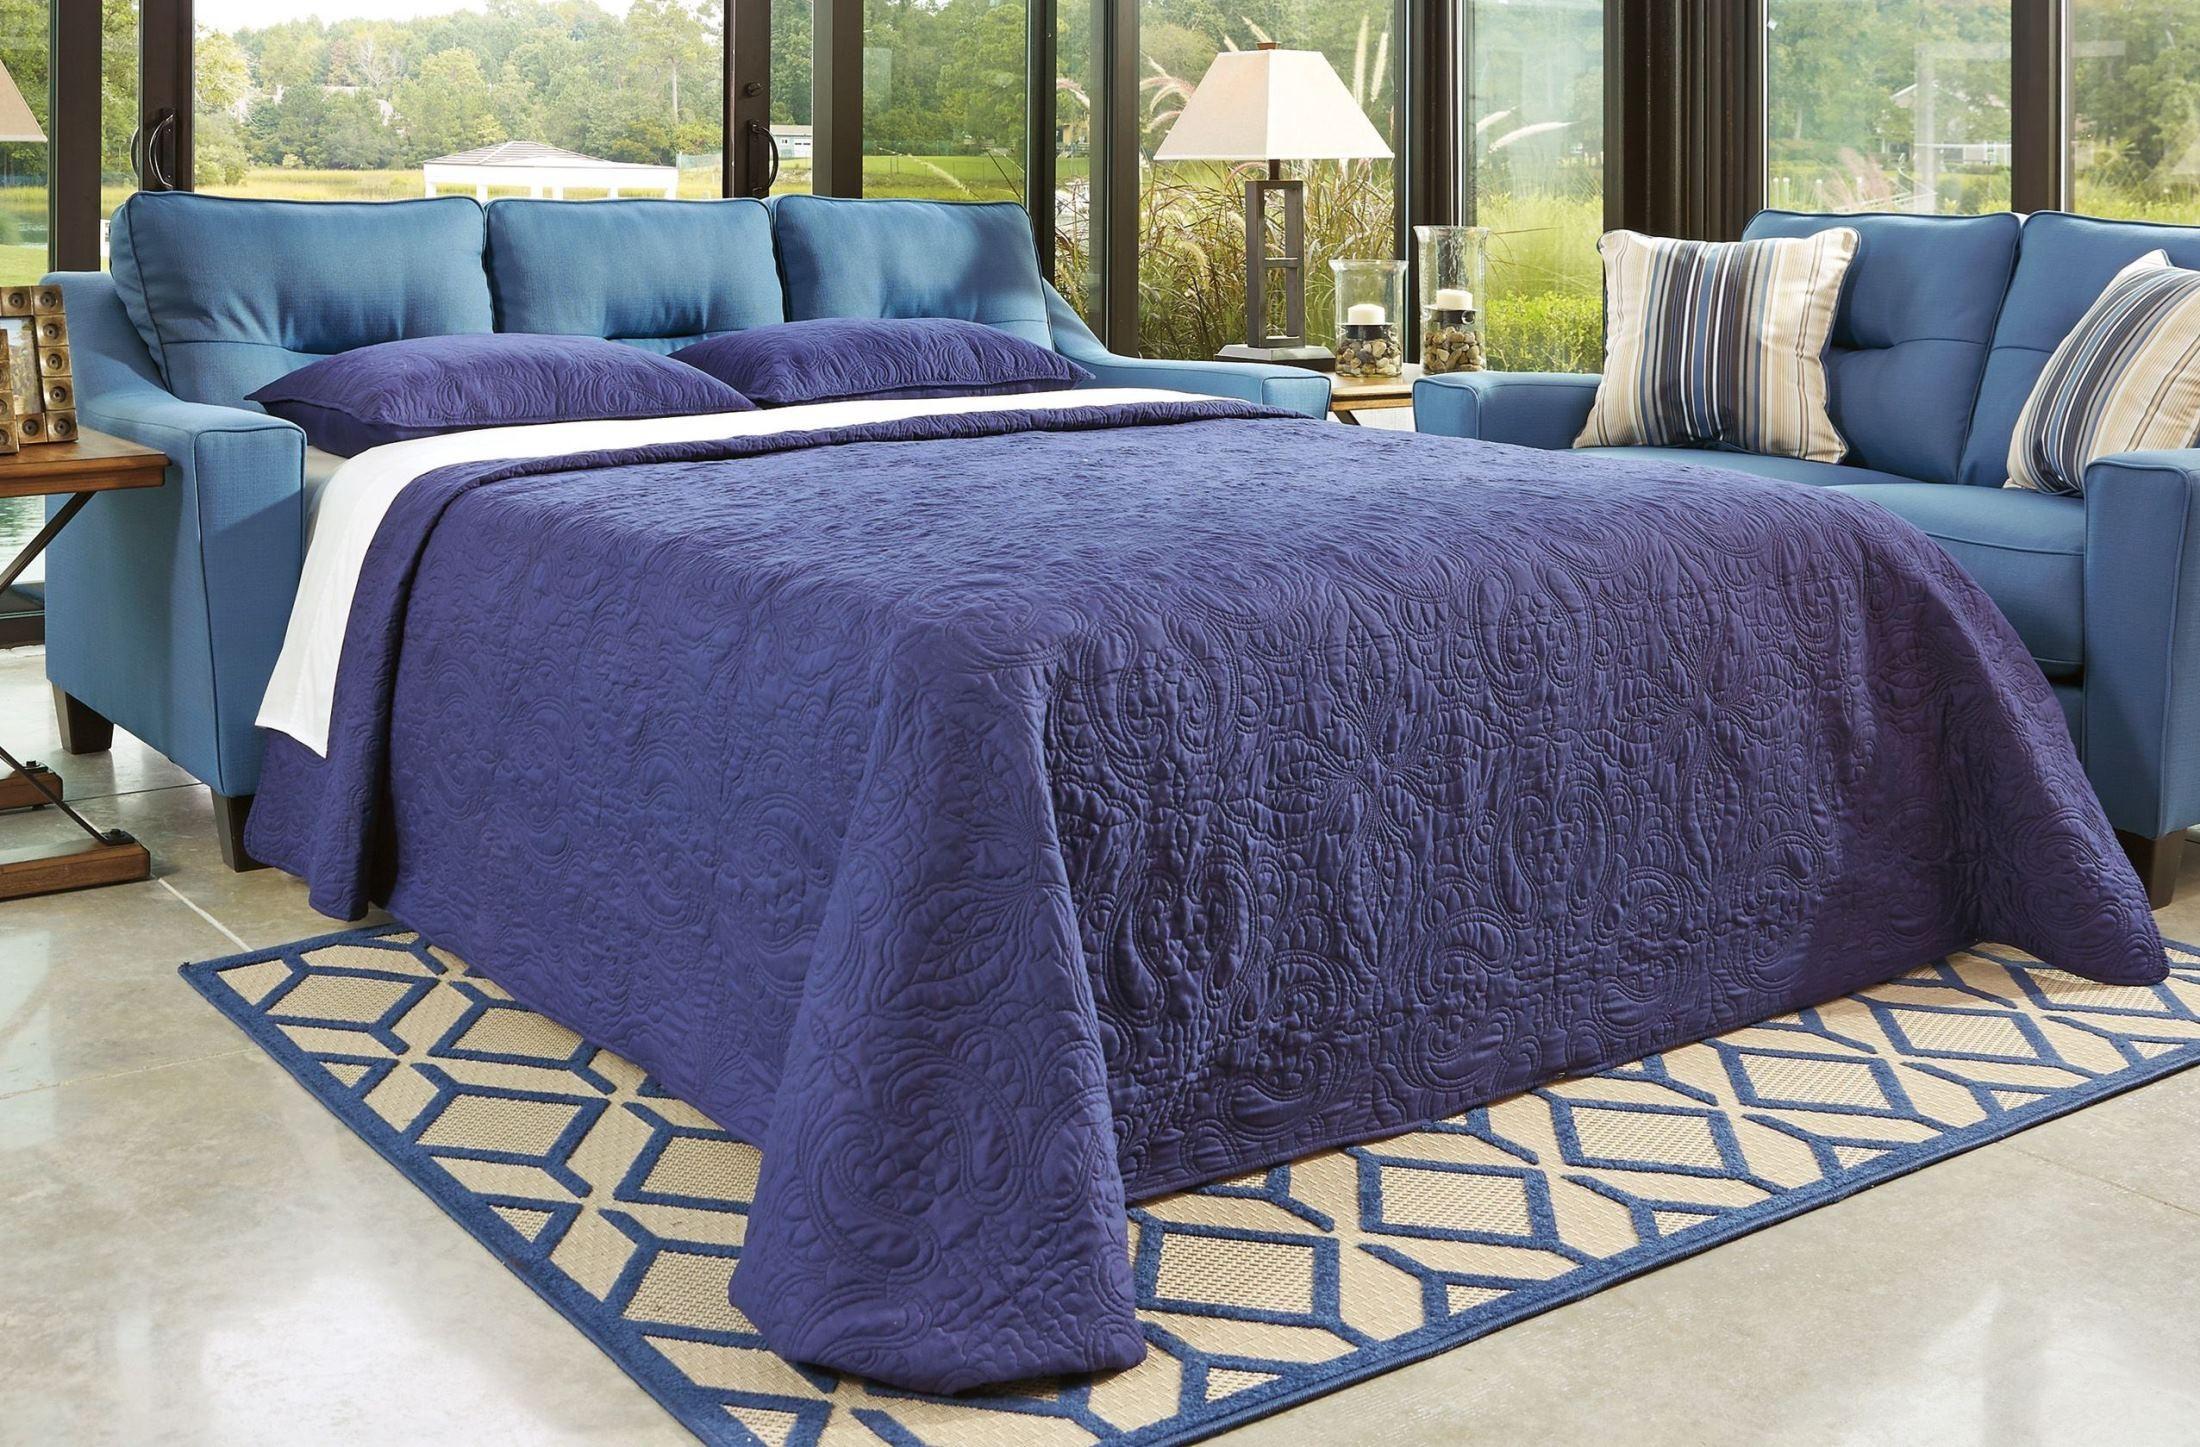 Forsan Nuvella Blue Queen Sofa Sleeper From Ashley